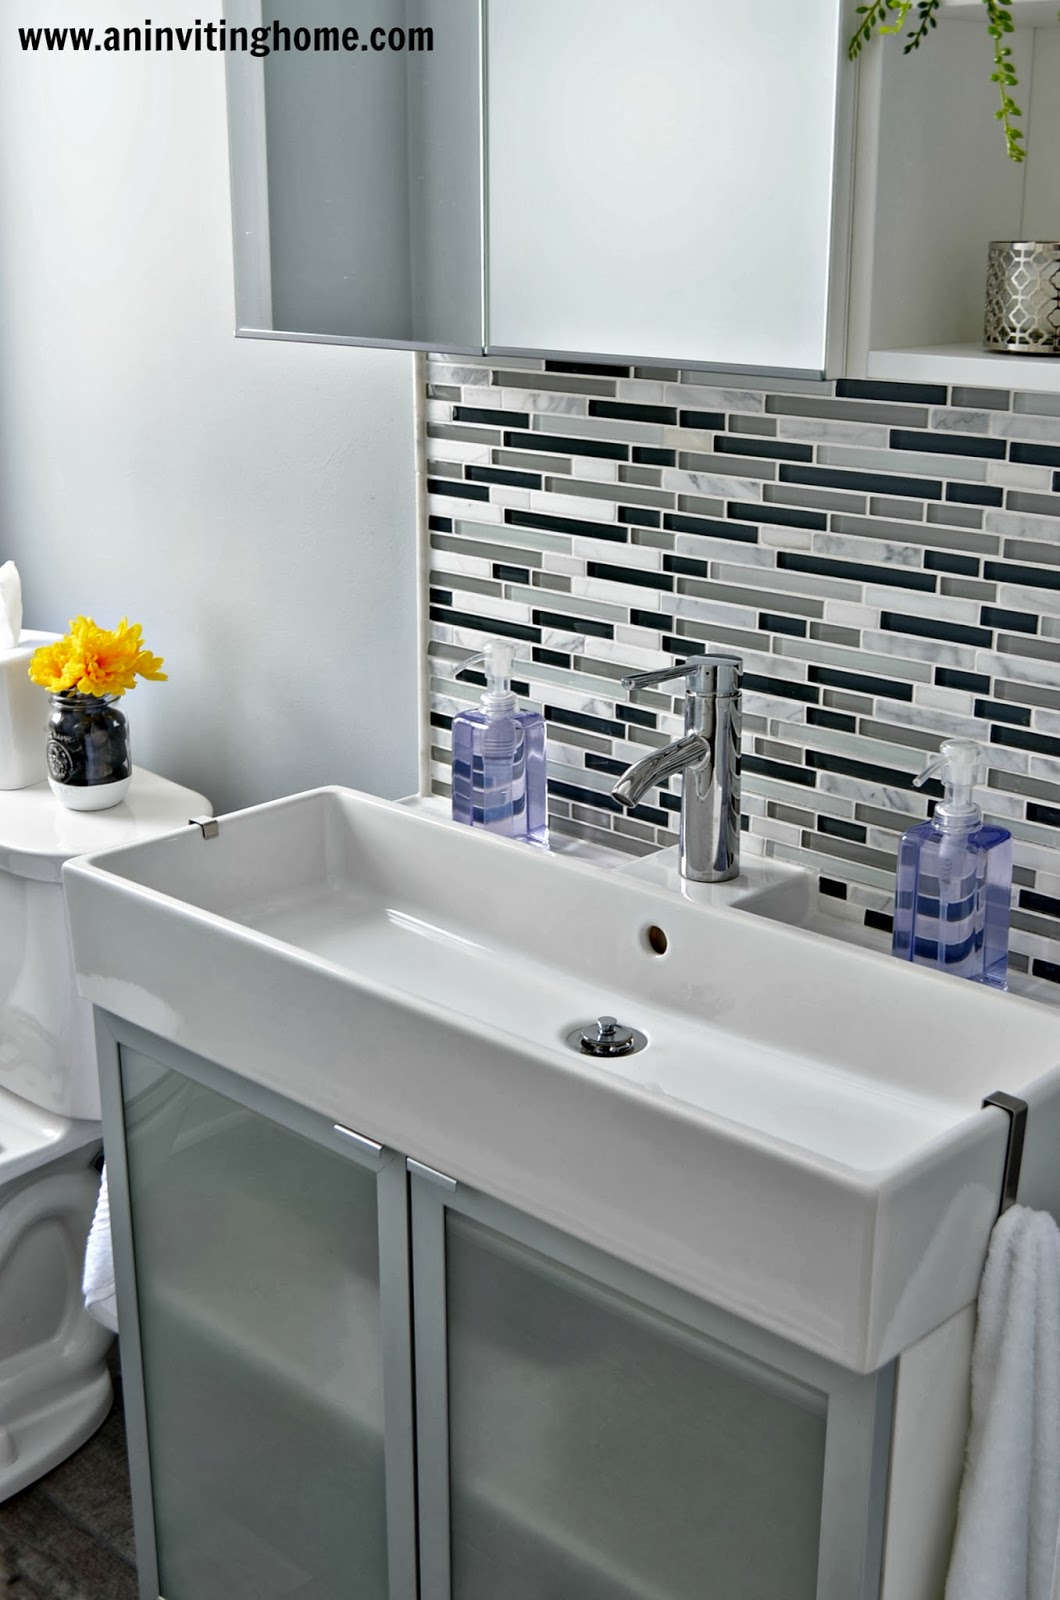 Marvelous modern bathroom update An Inviting Home on Remodelaholic